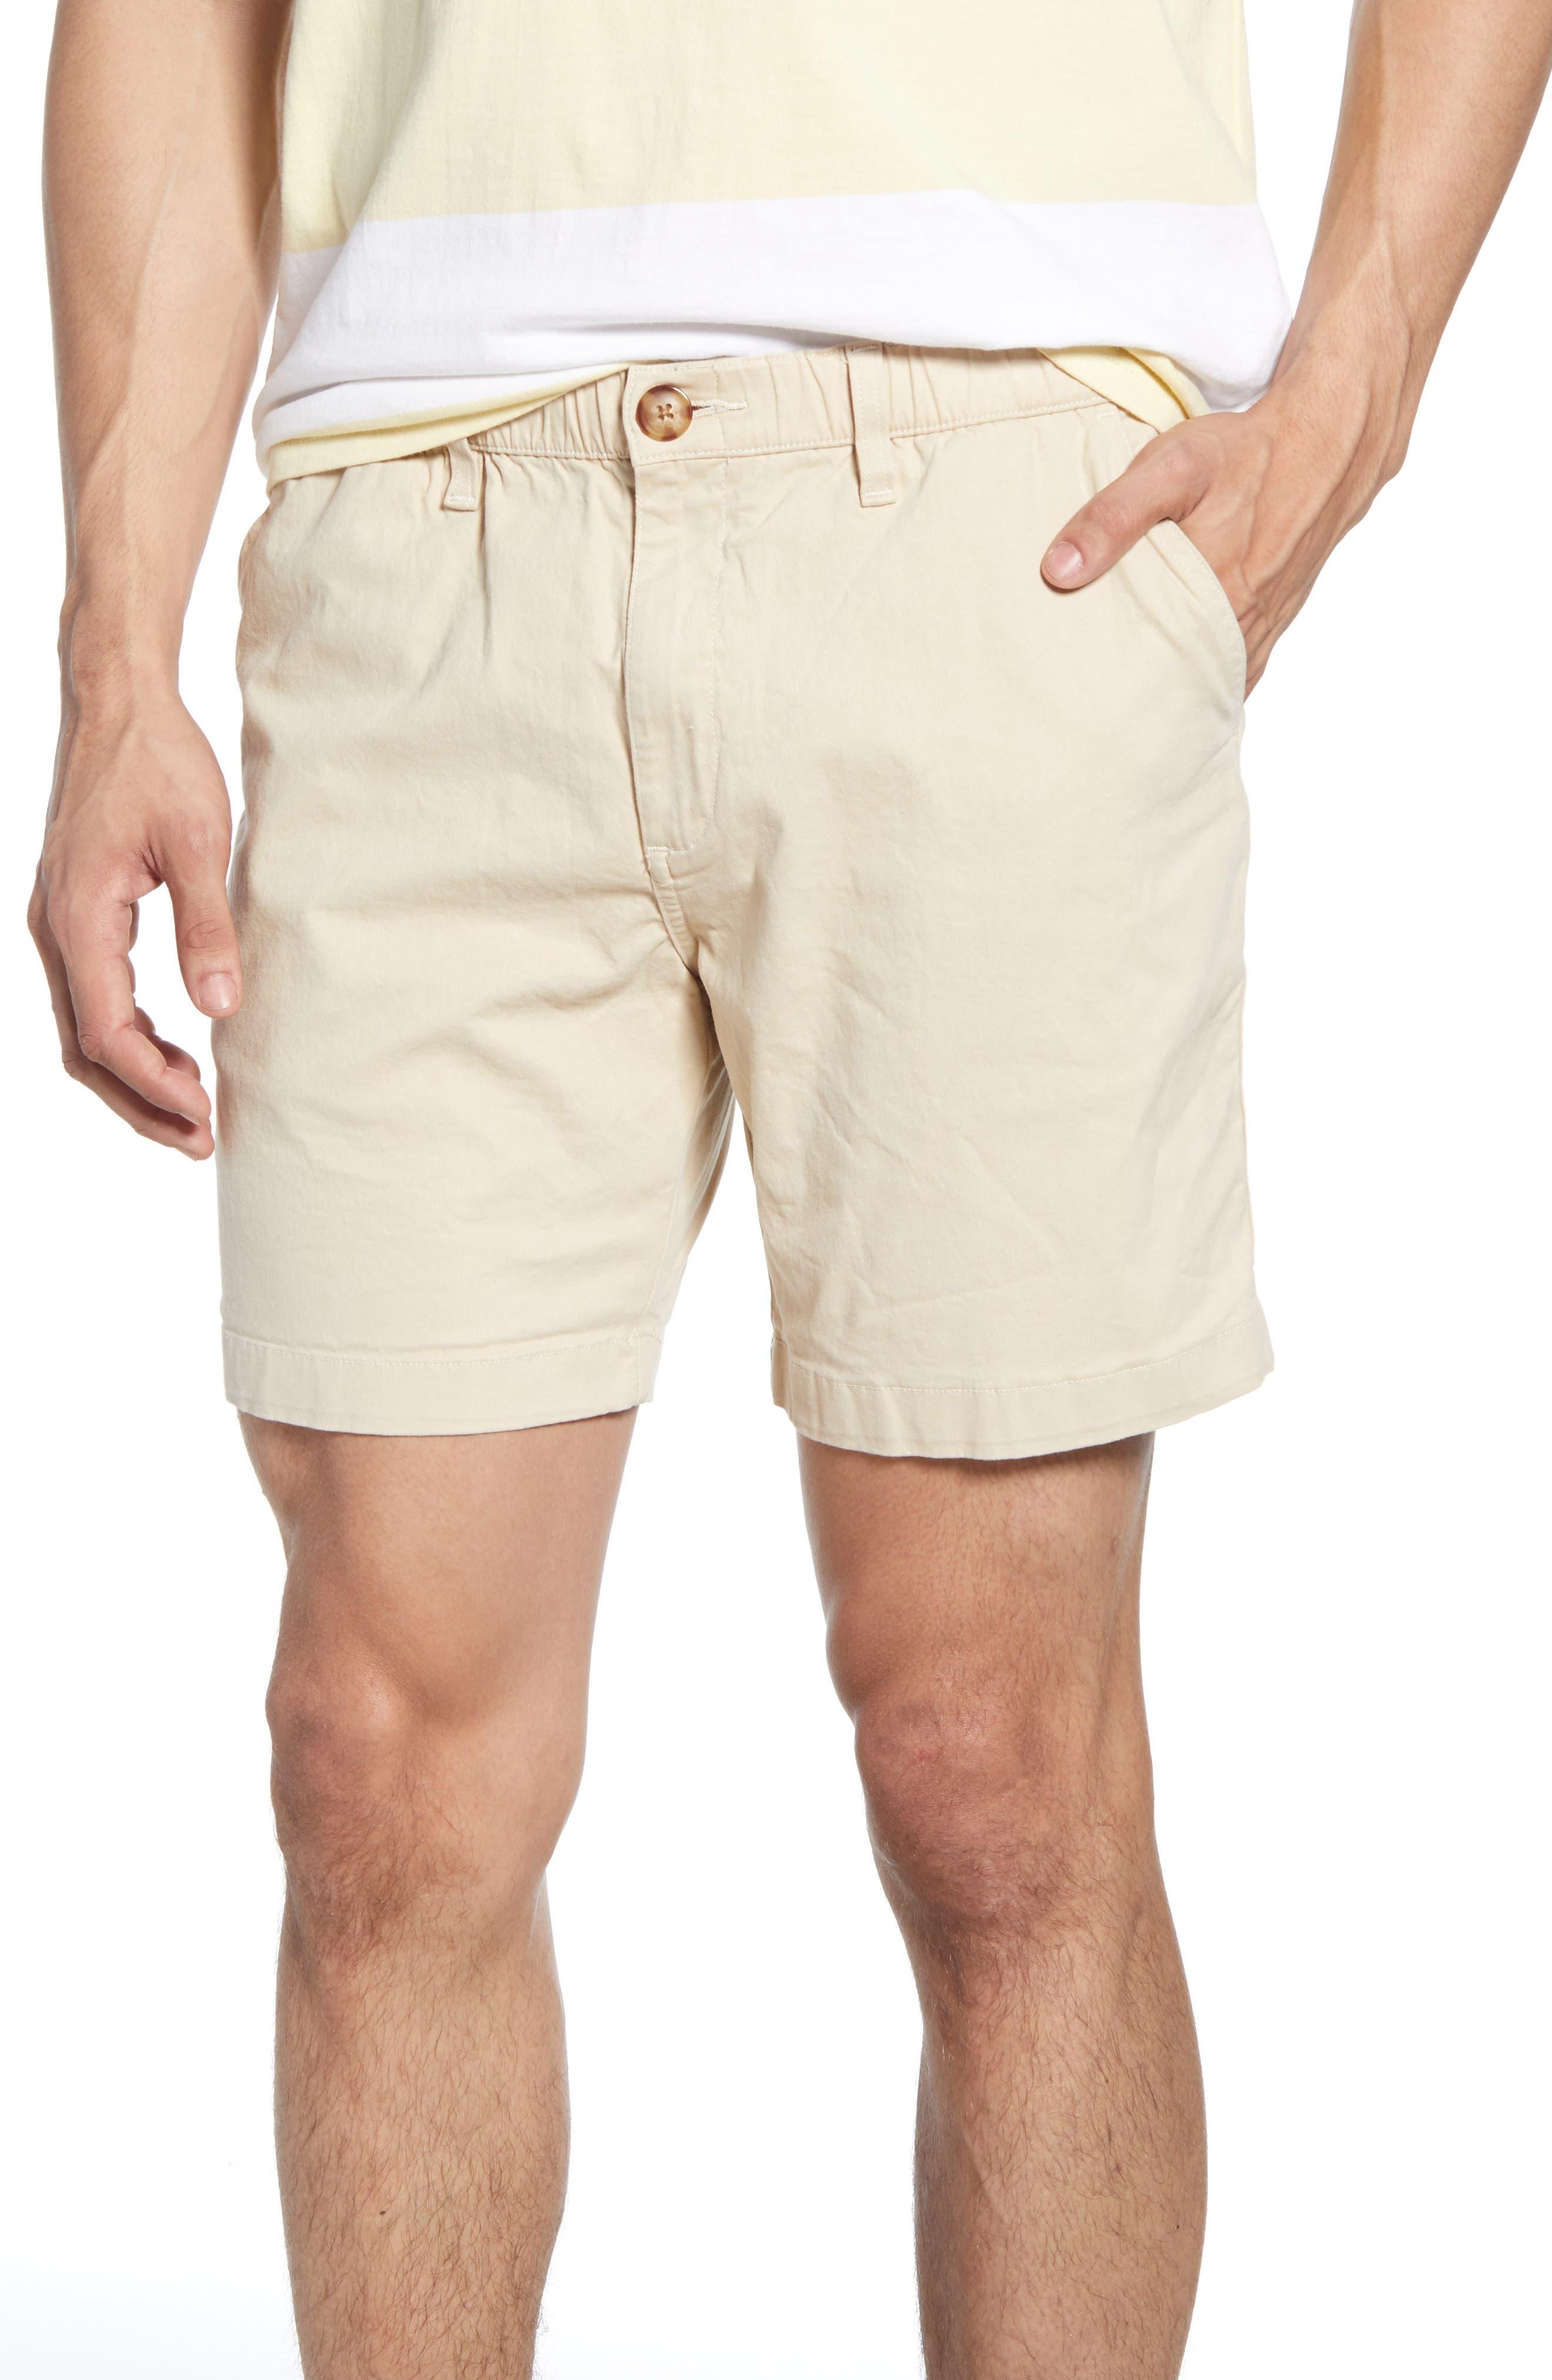 The Khakinators 5 1/2-Inch Inseam Shorts